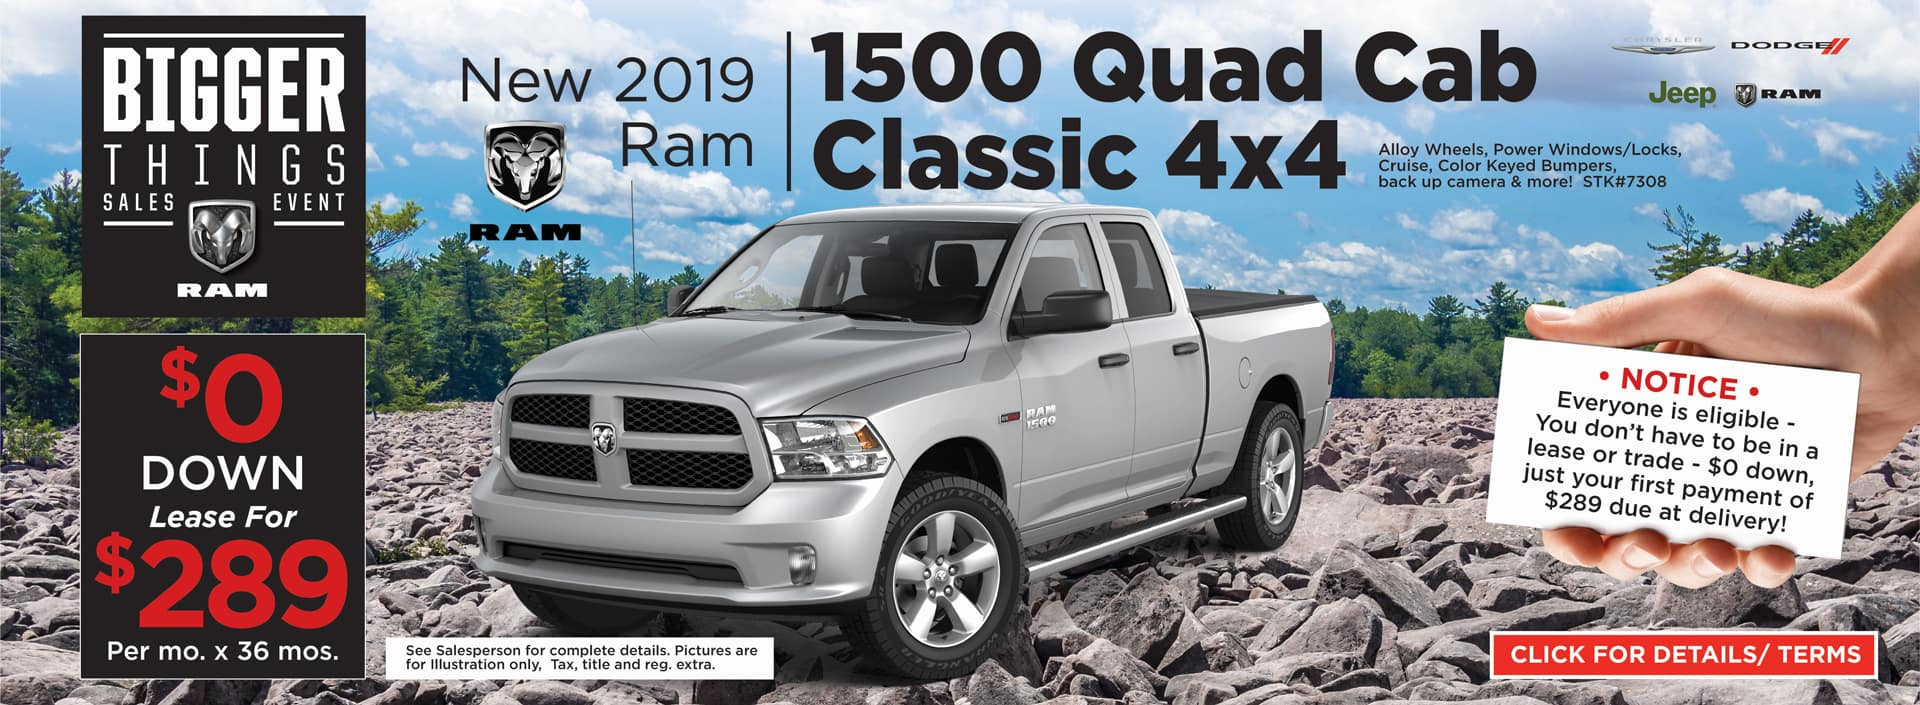 hight resolution of 2019 ram quad cab